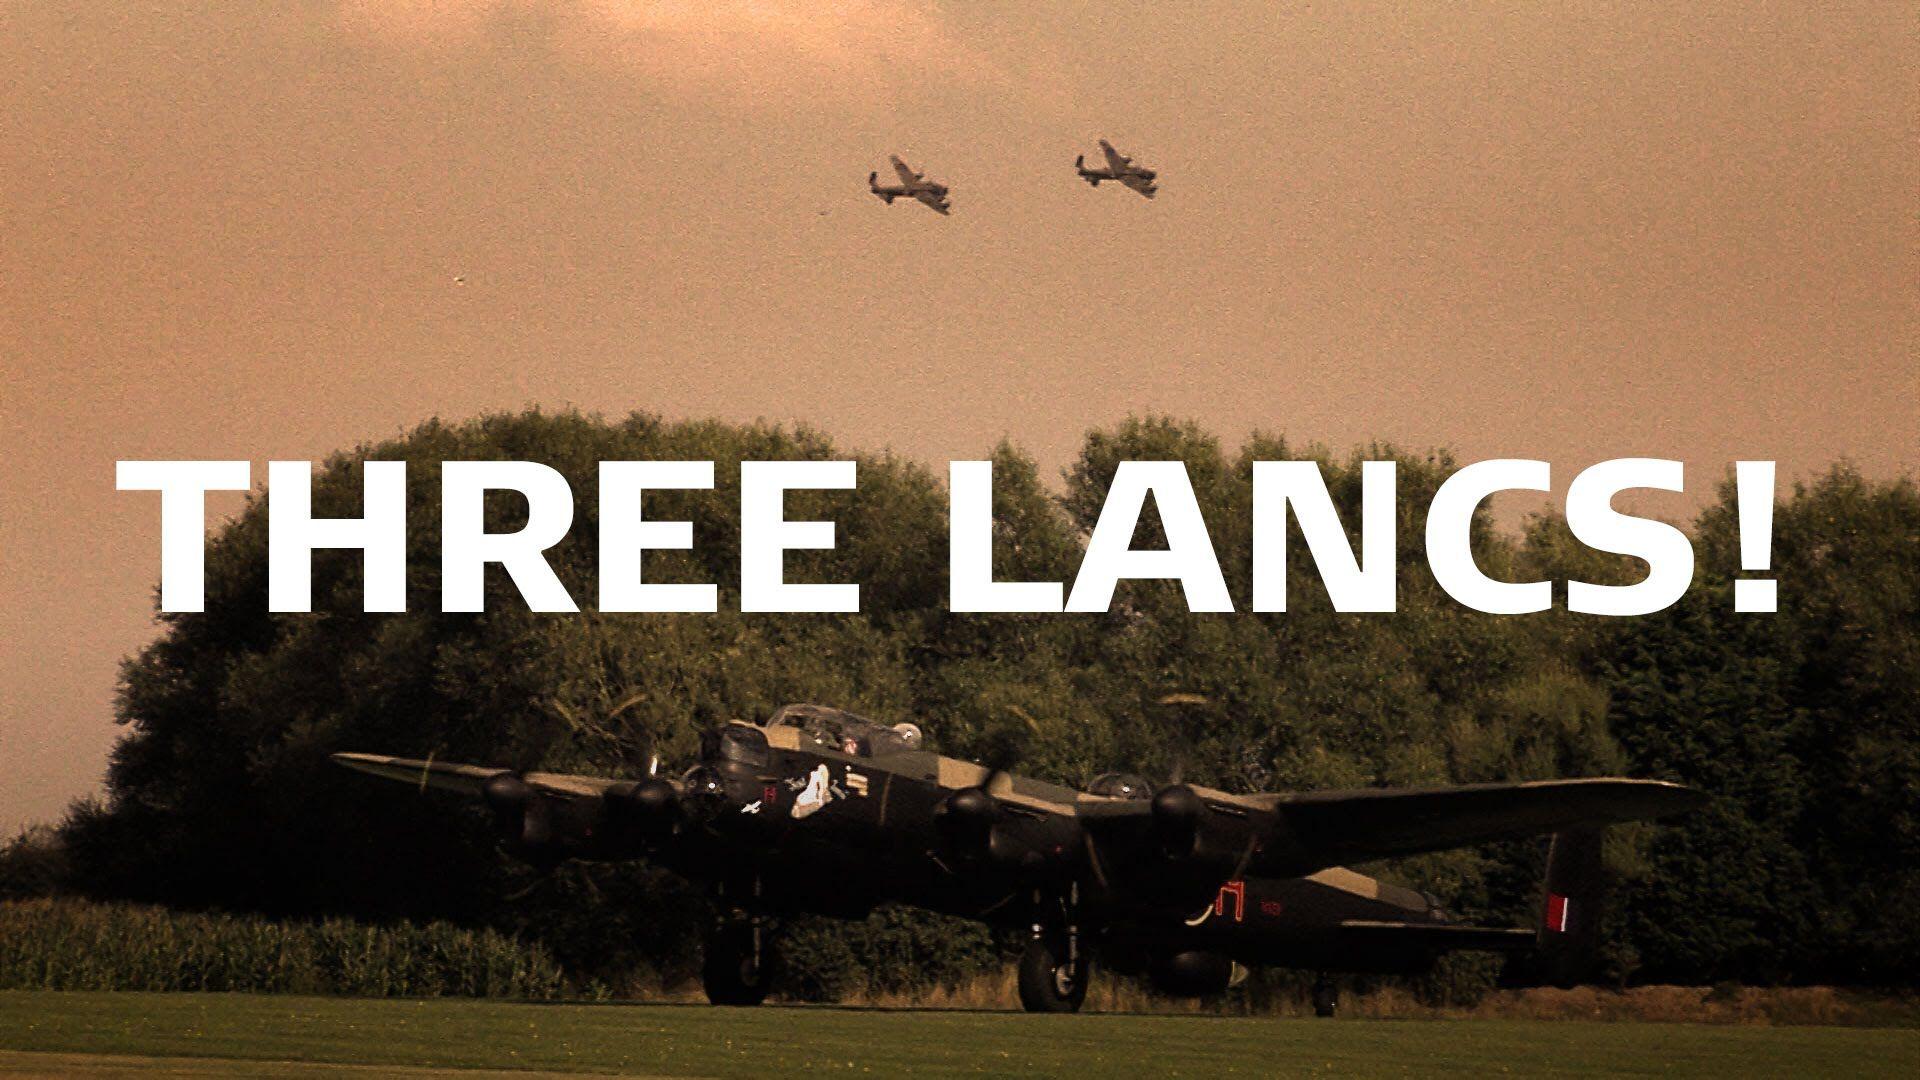 Three Lancasters Meet at East Kirkby 2014 Lancaster